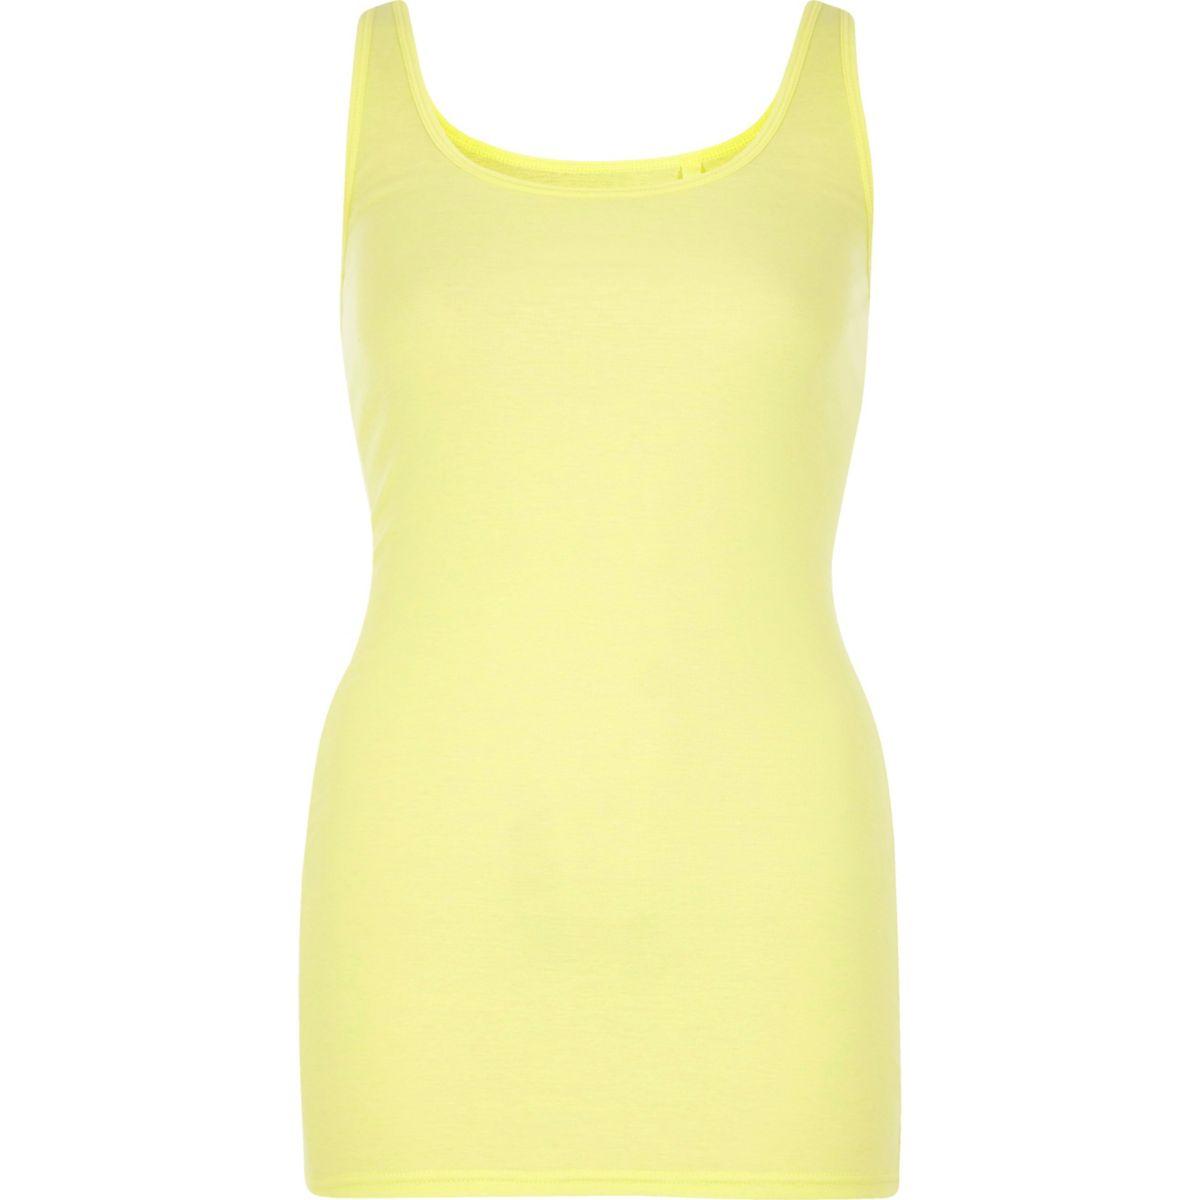 Yellow scoop neck vest